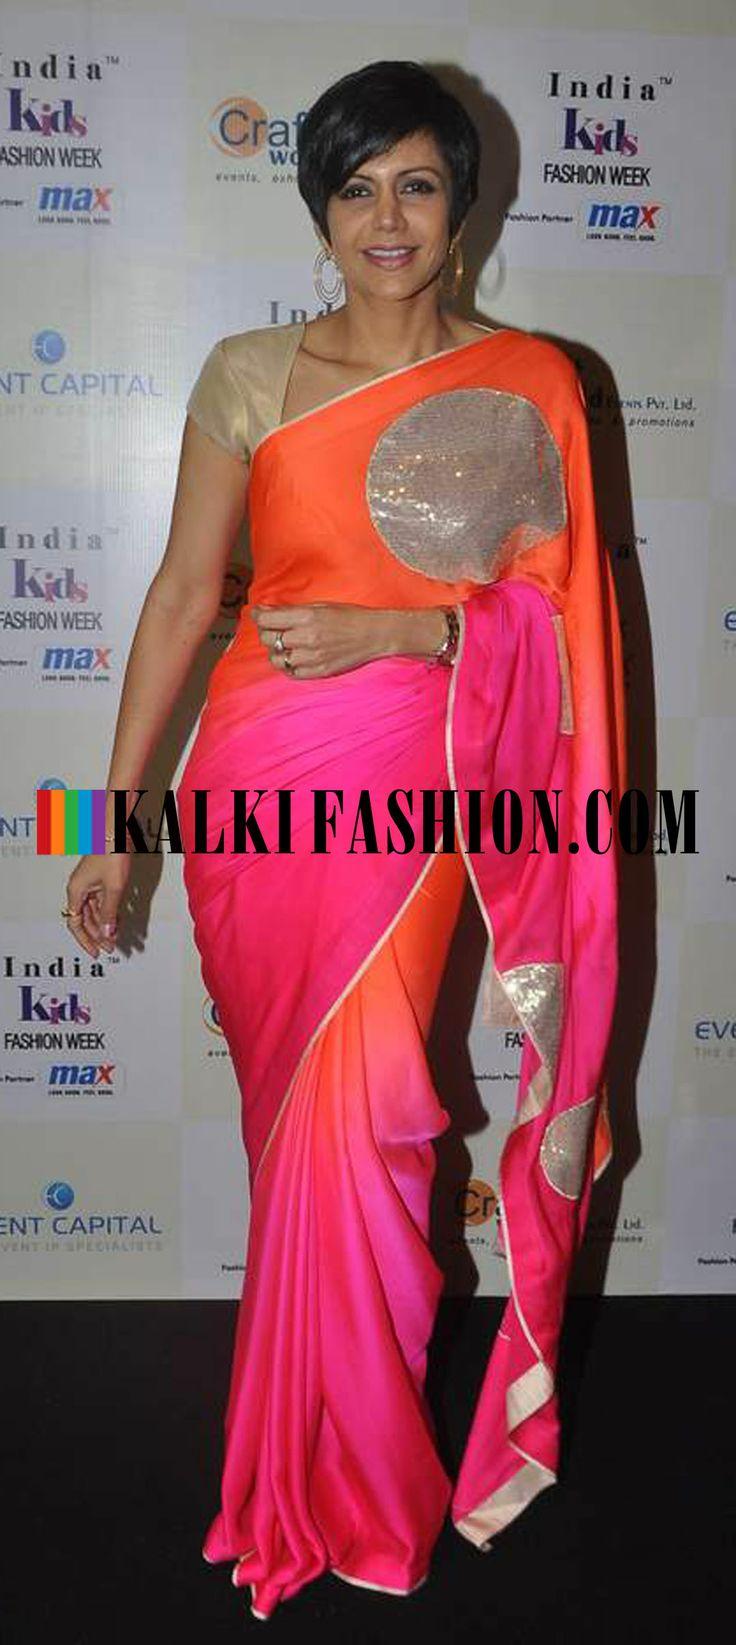 http://www.kalkifashion.com/ Mandira Bedi in a pink and orange shaded saree attend the Kids Fashion Week